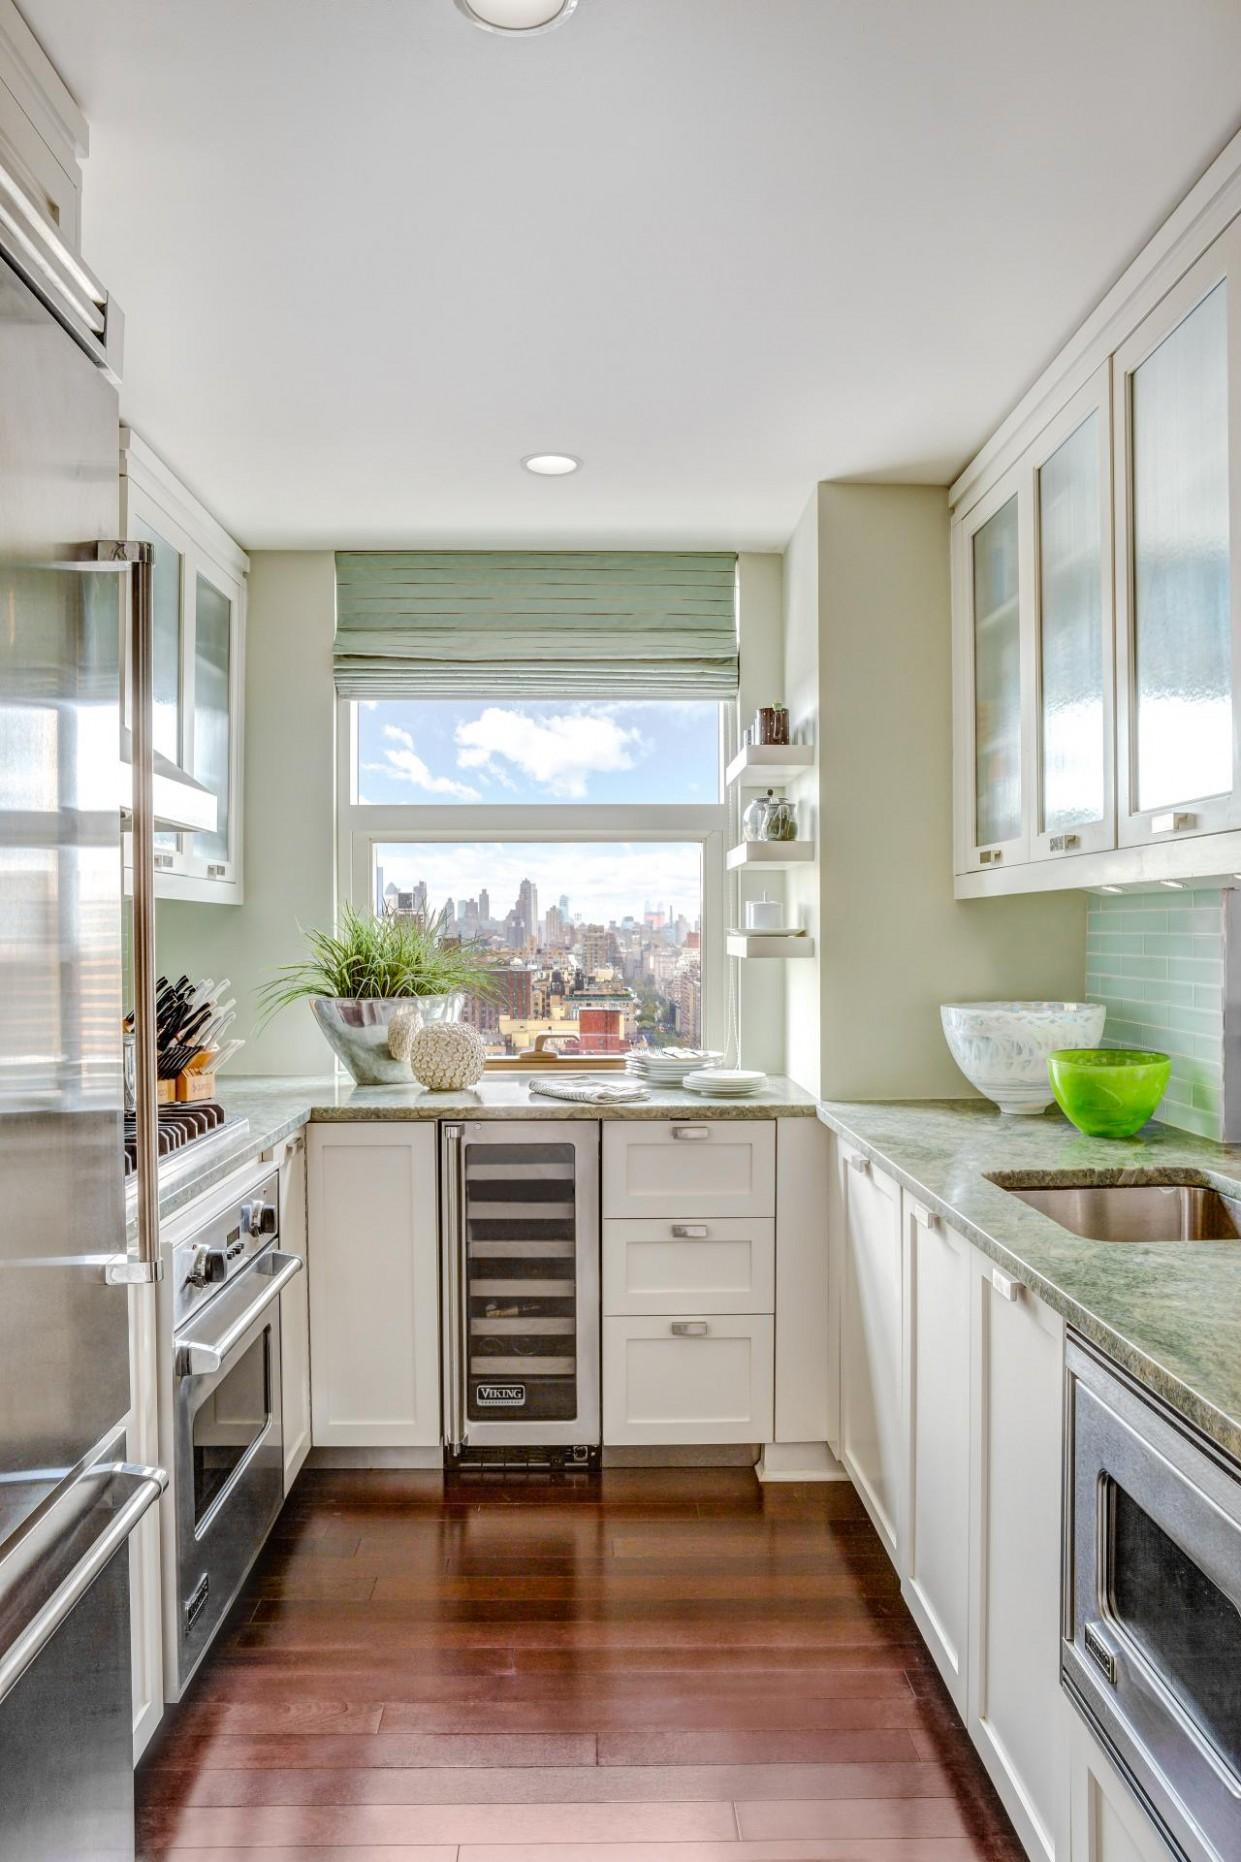 11 Ways to Make a Small Kitchen Sizzle  DIY - Diy Galley Kitchen Cabinet Ideas